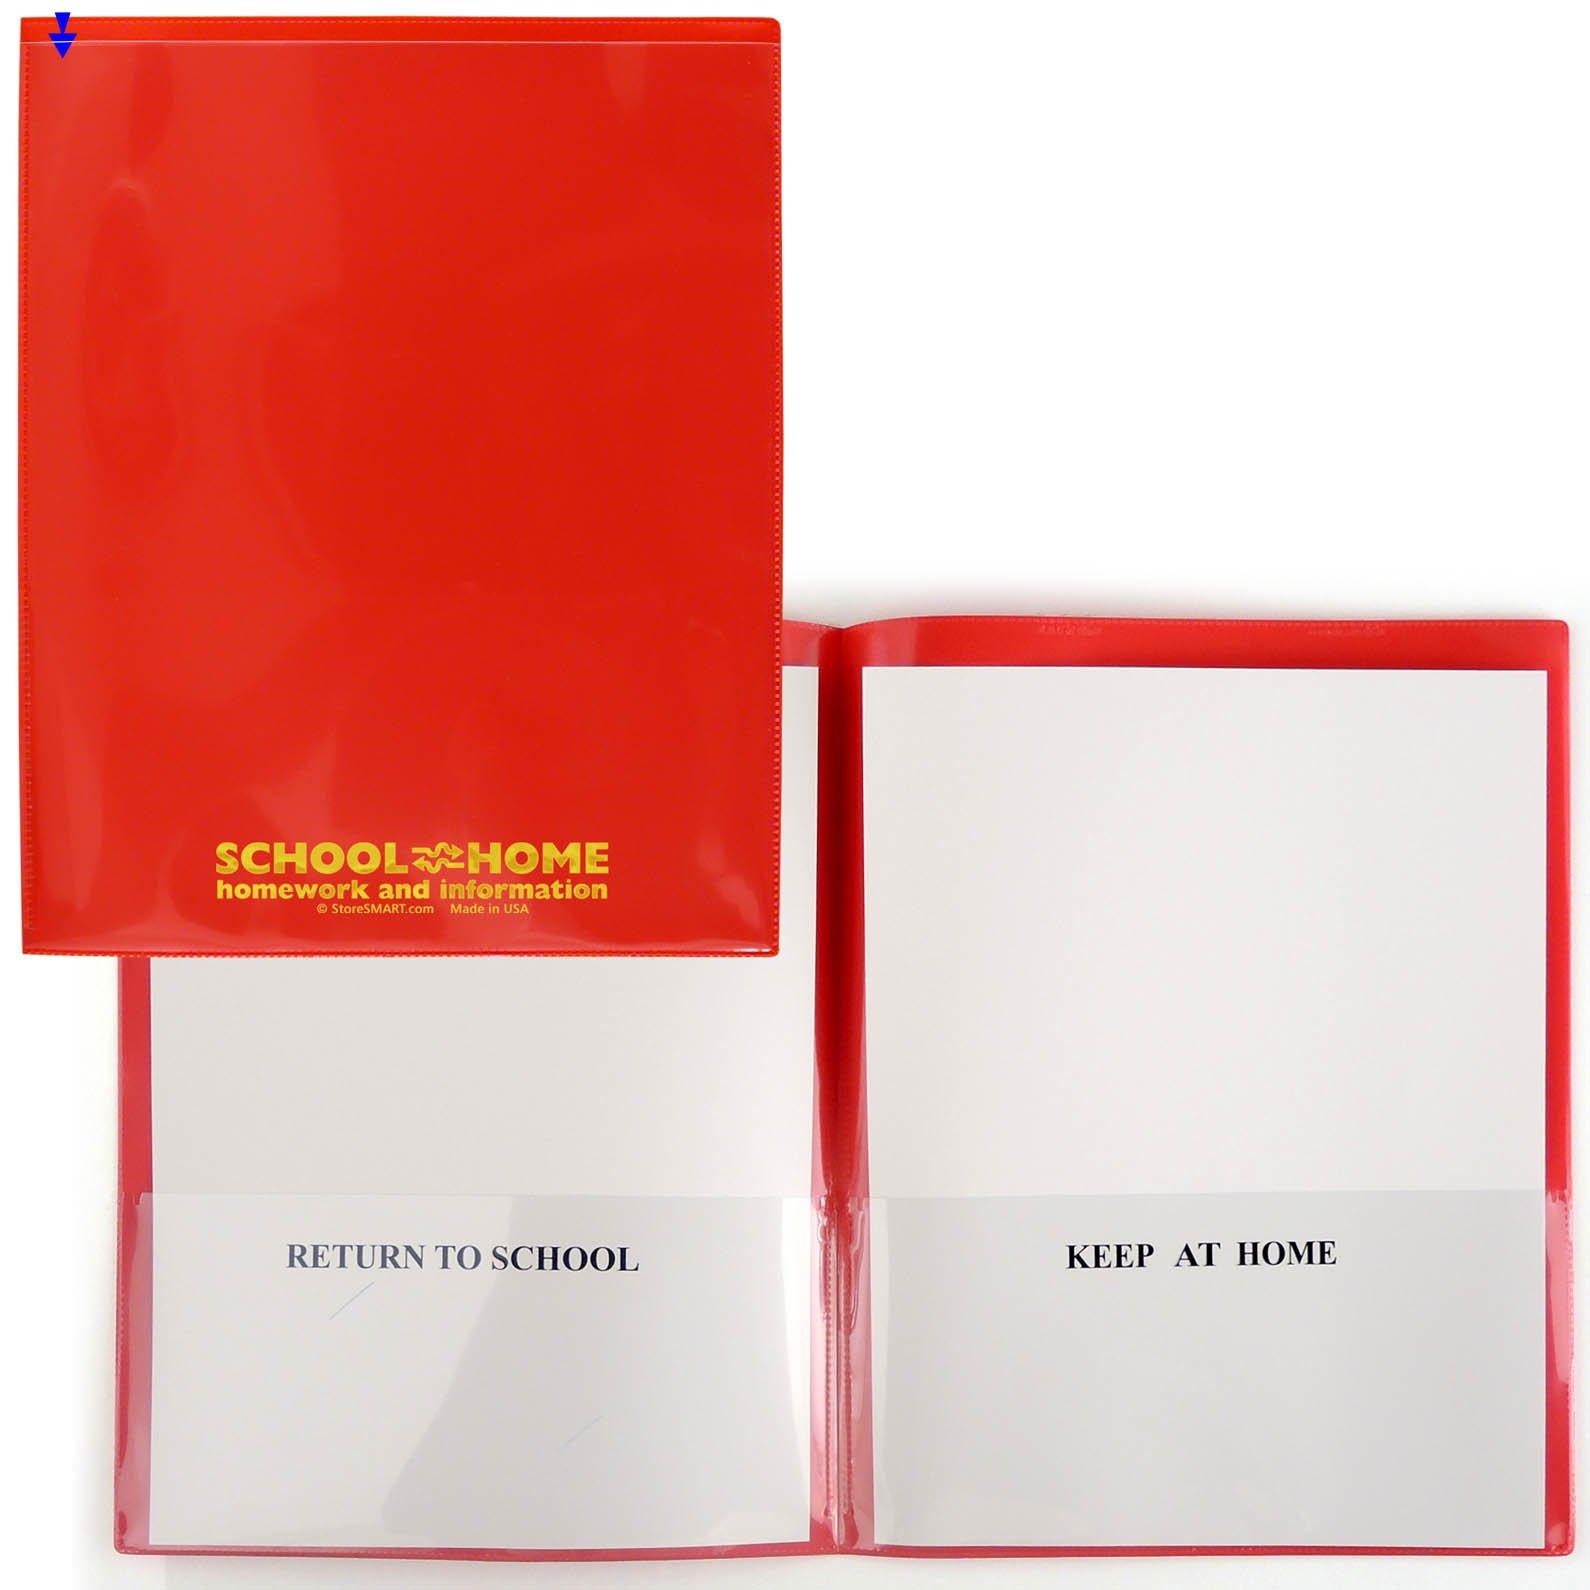 StoreSMART Red Plastic CUSTOM School/Home Folders 100-pack - Letter-Size Twin Pocket - SH900SV-PRINT-R-100